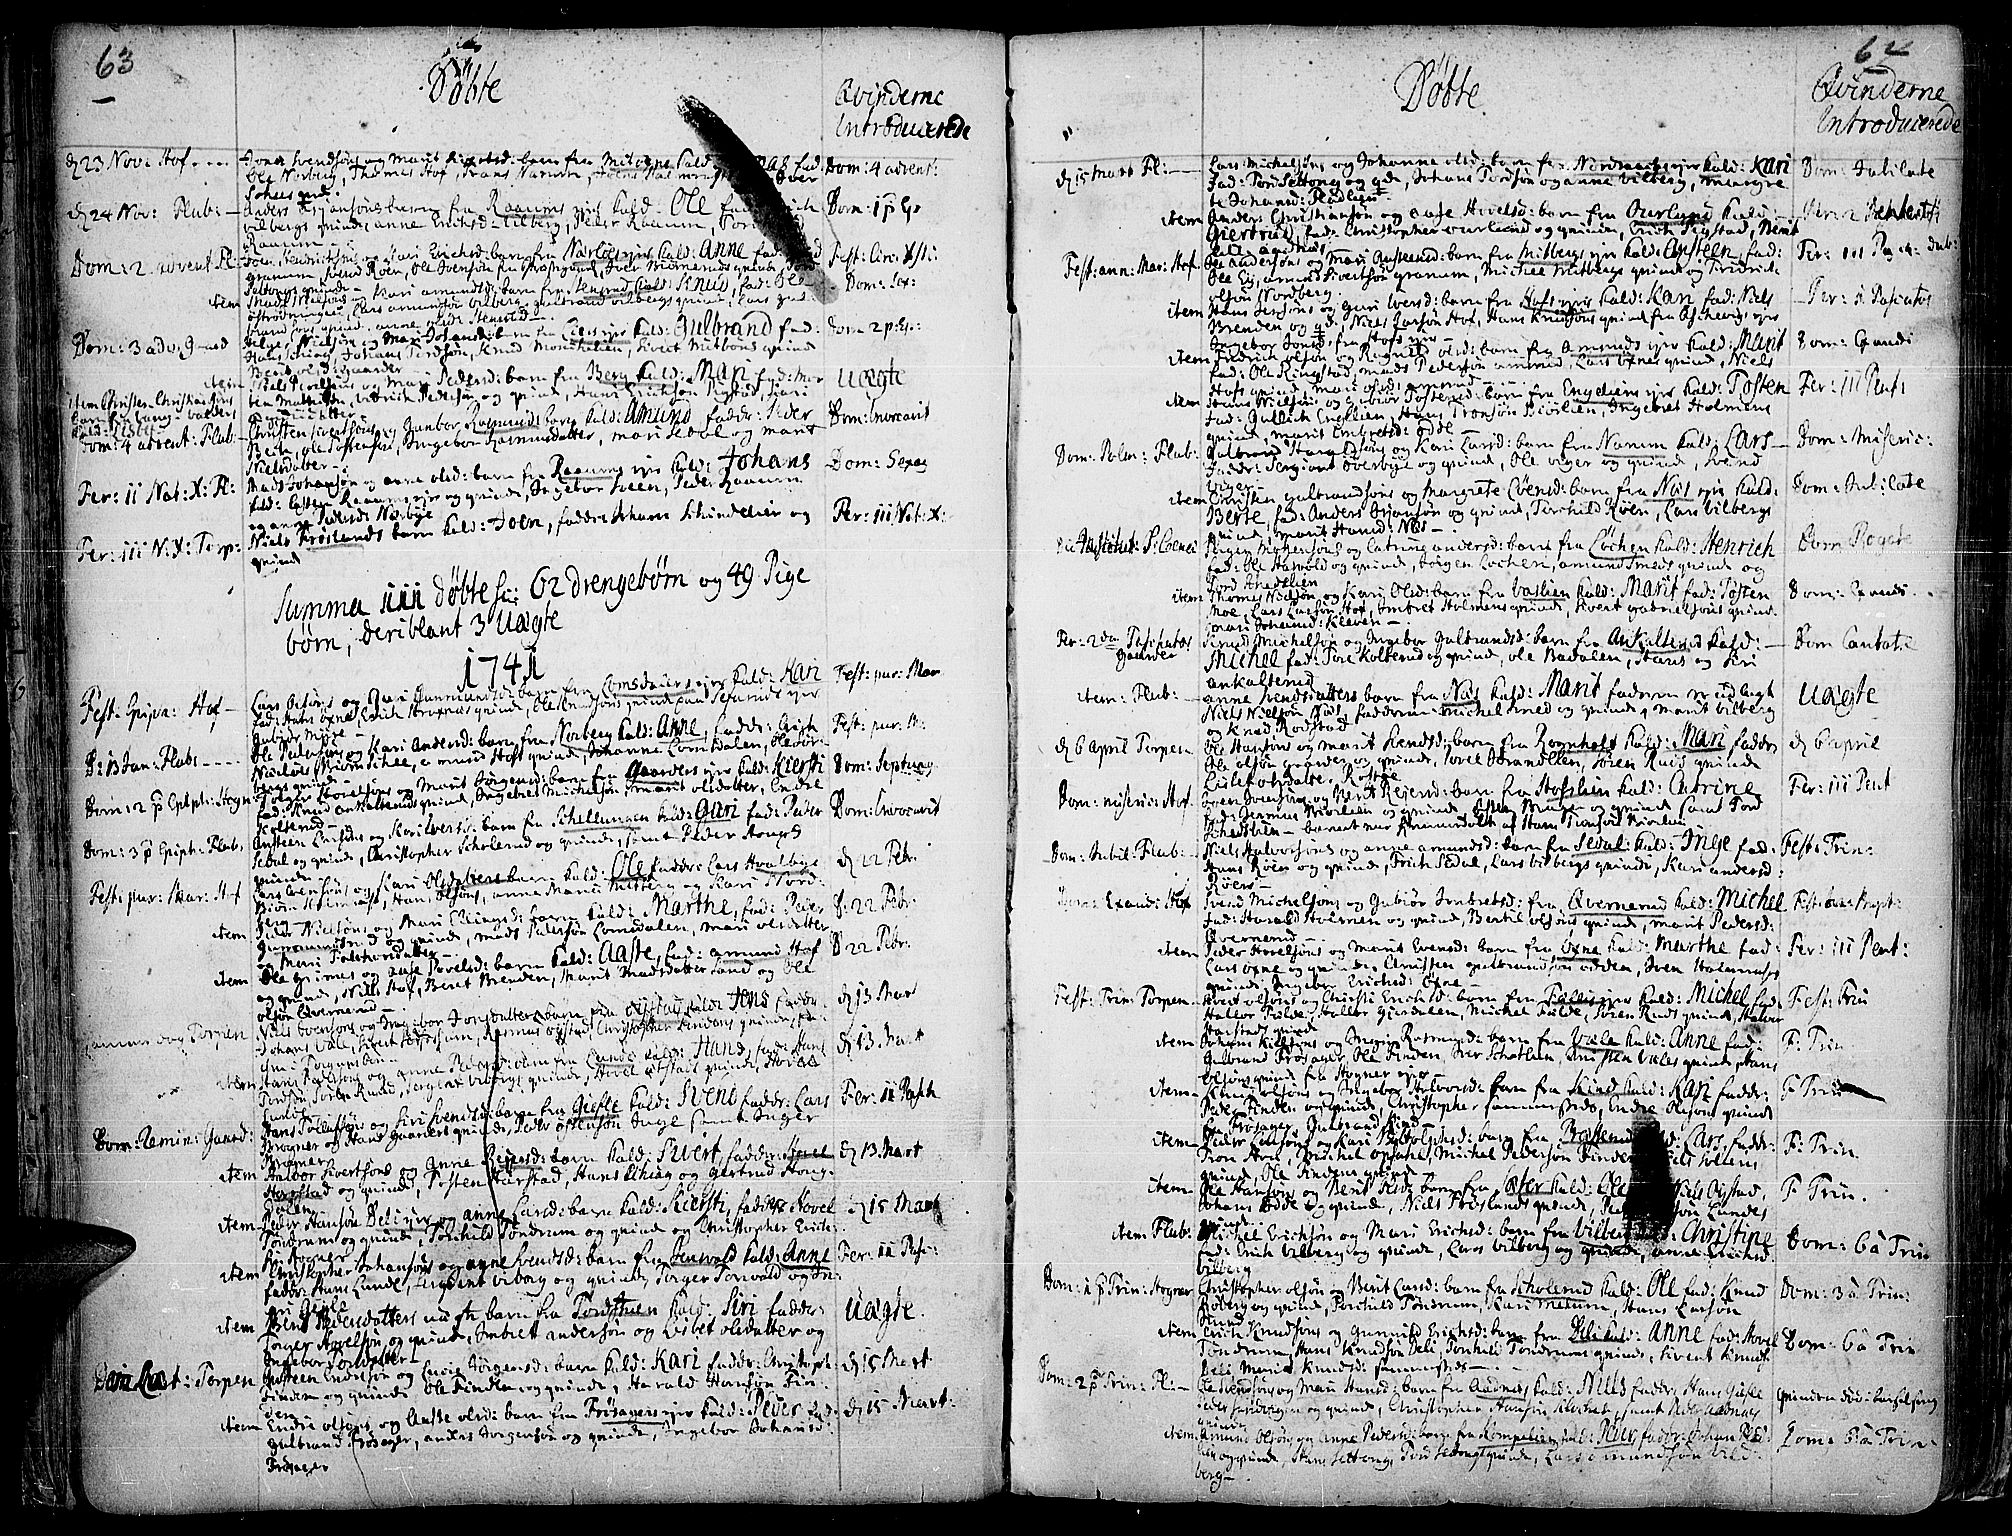 SAH, Land prestekontor, Ministerialbok nr. 2, 1733-1764, s. 63-64